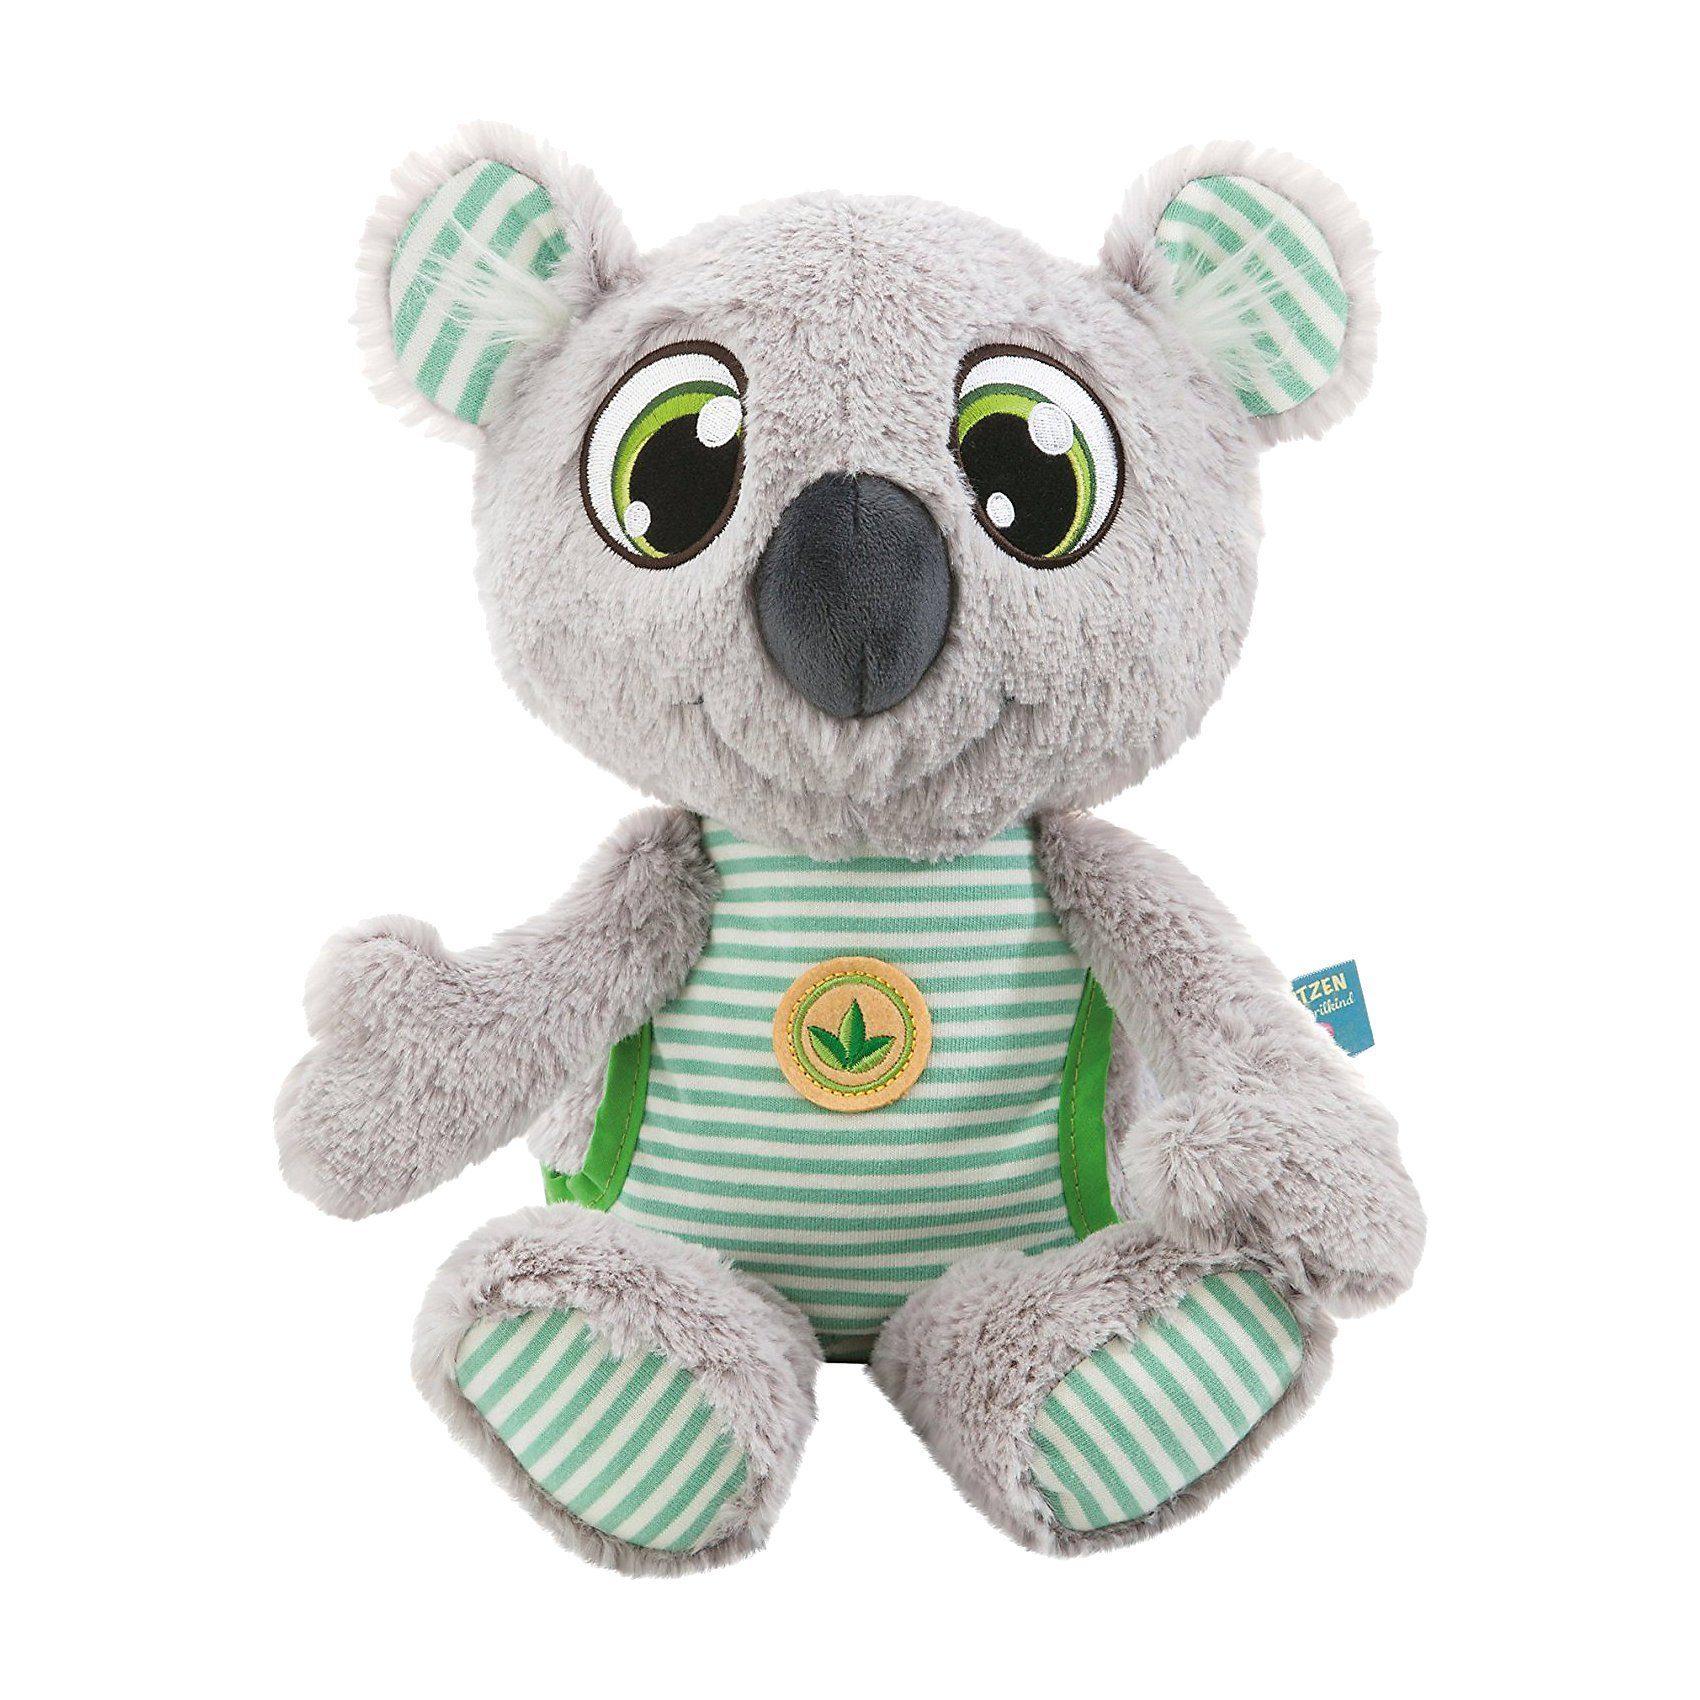 Schlafmützen Koala Kappy 22cm (40842)